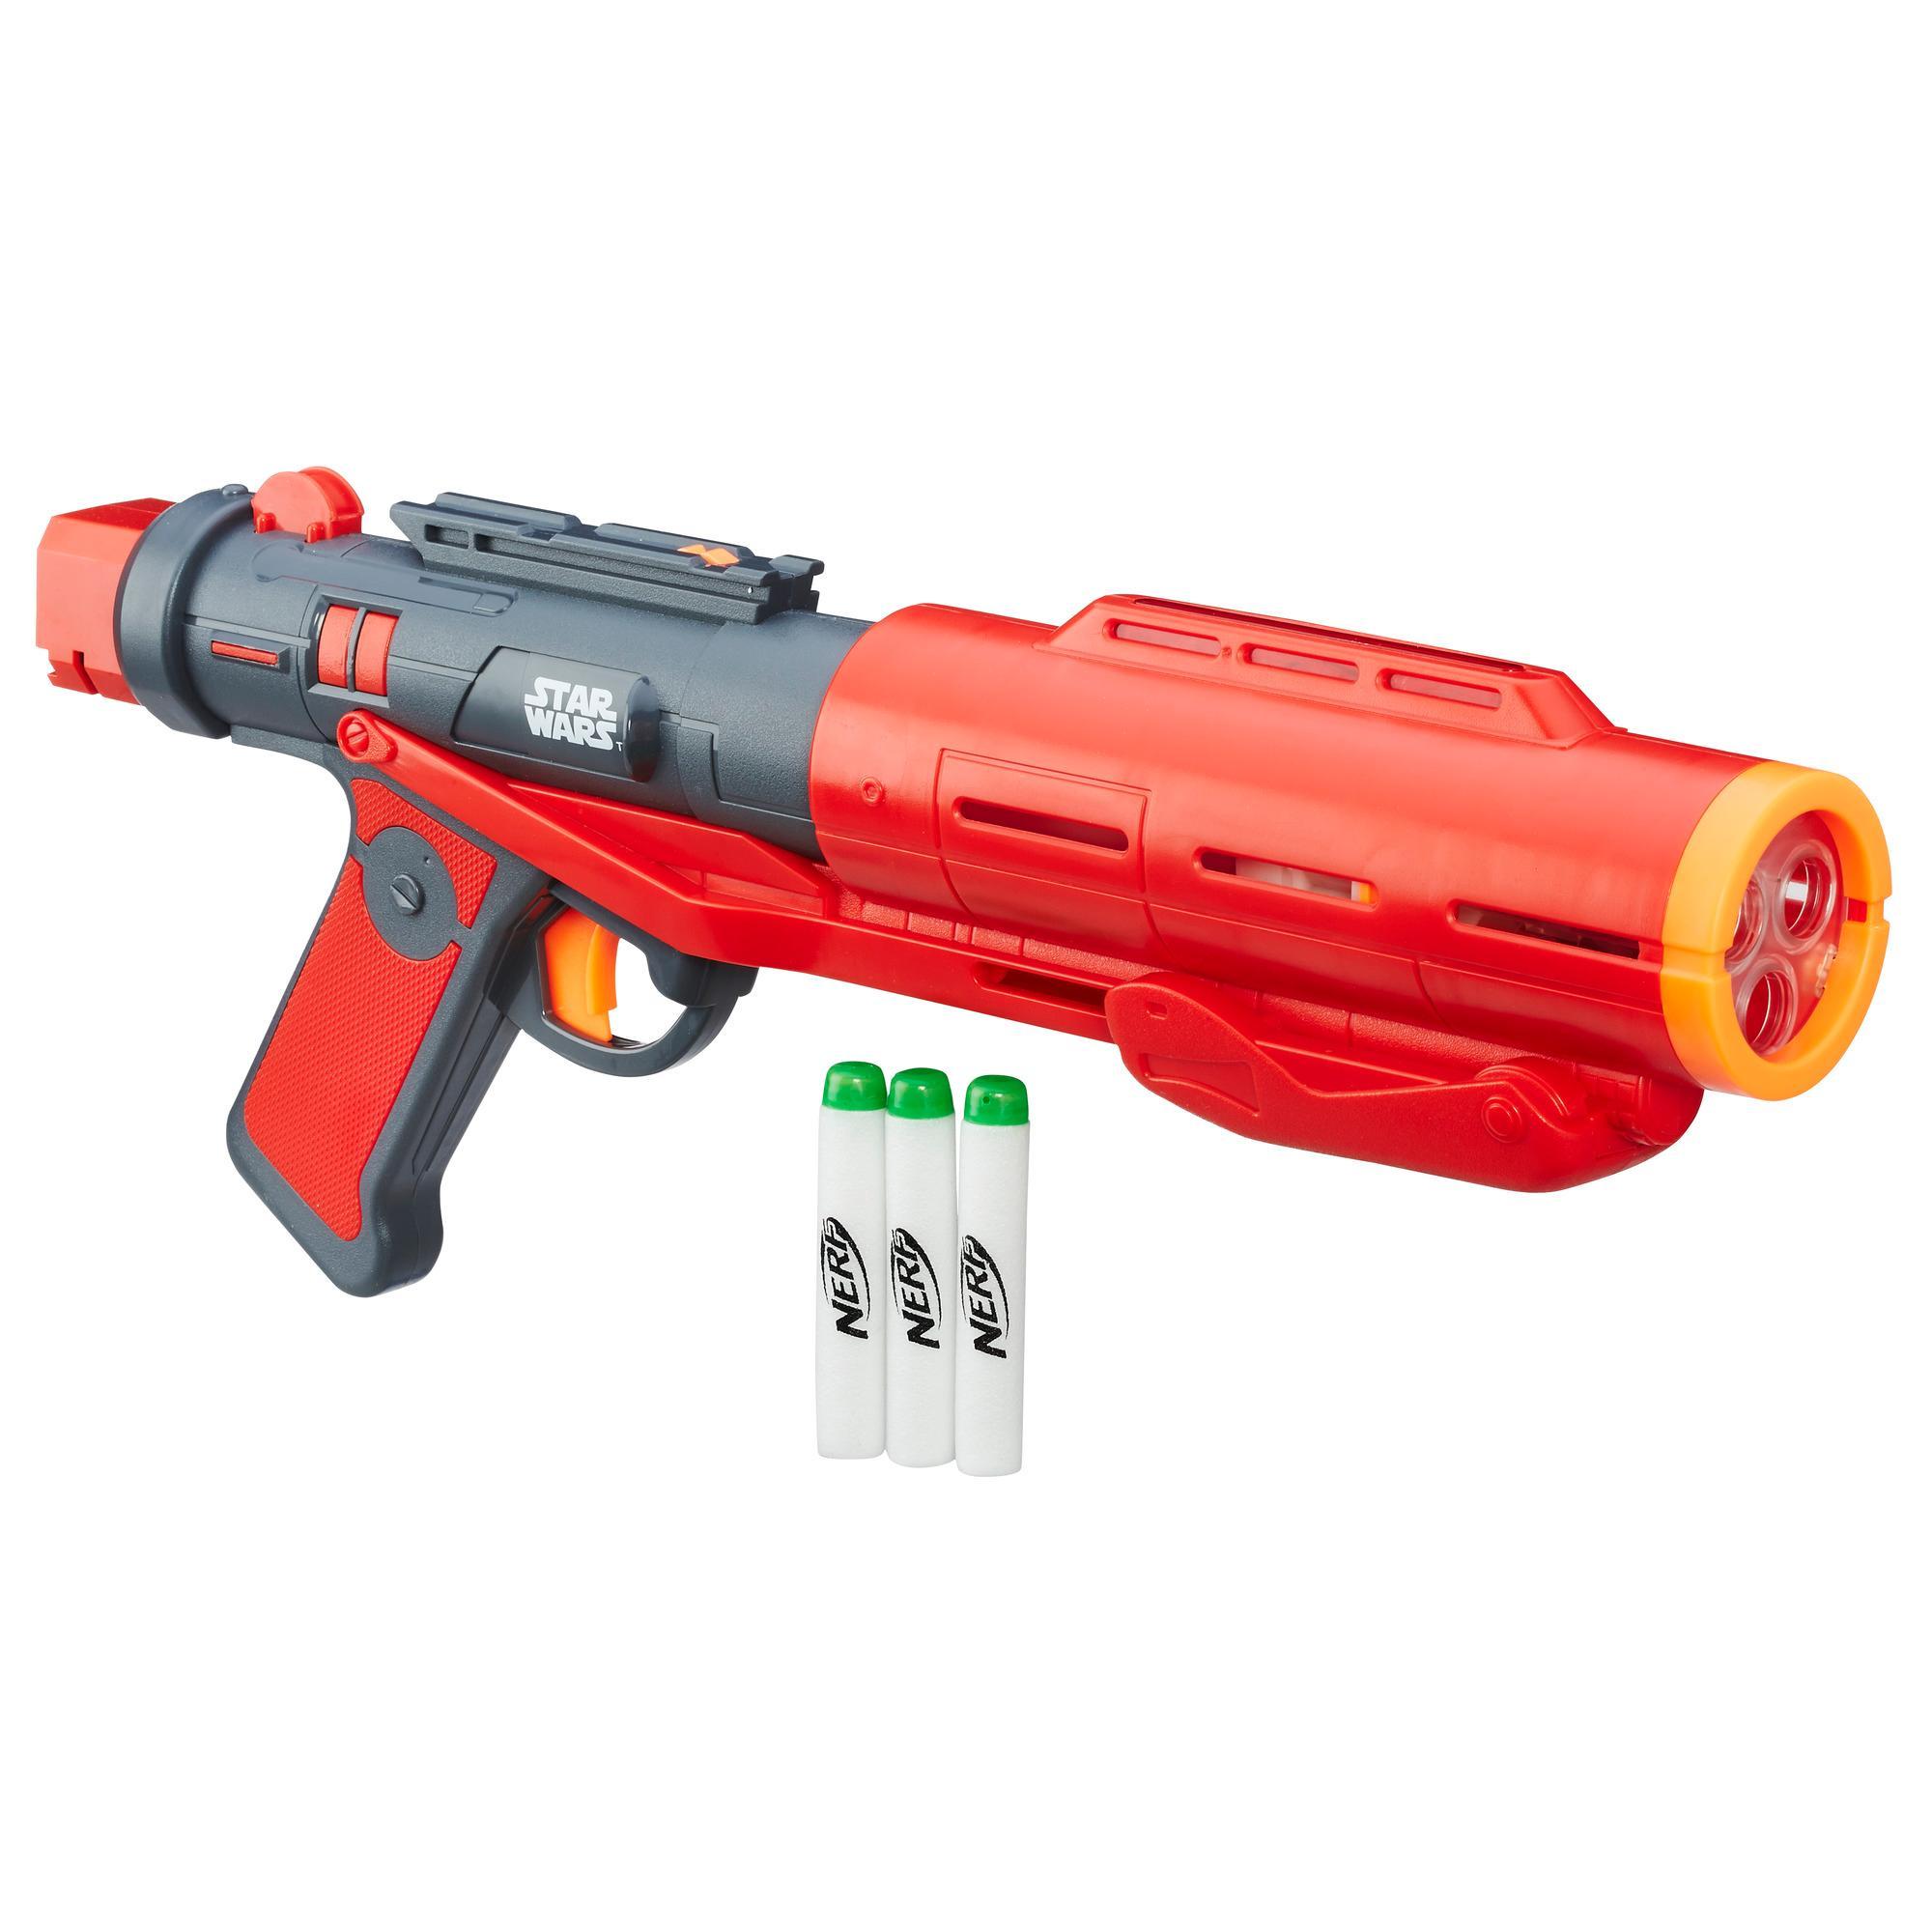 Star Wars R1 Imperial Death Trooper Dlx Blaster